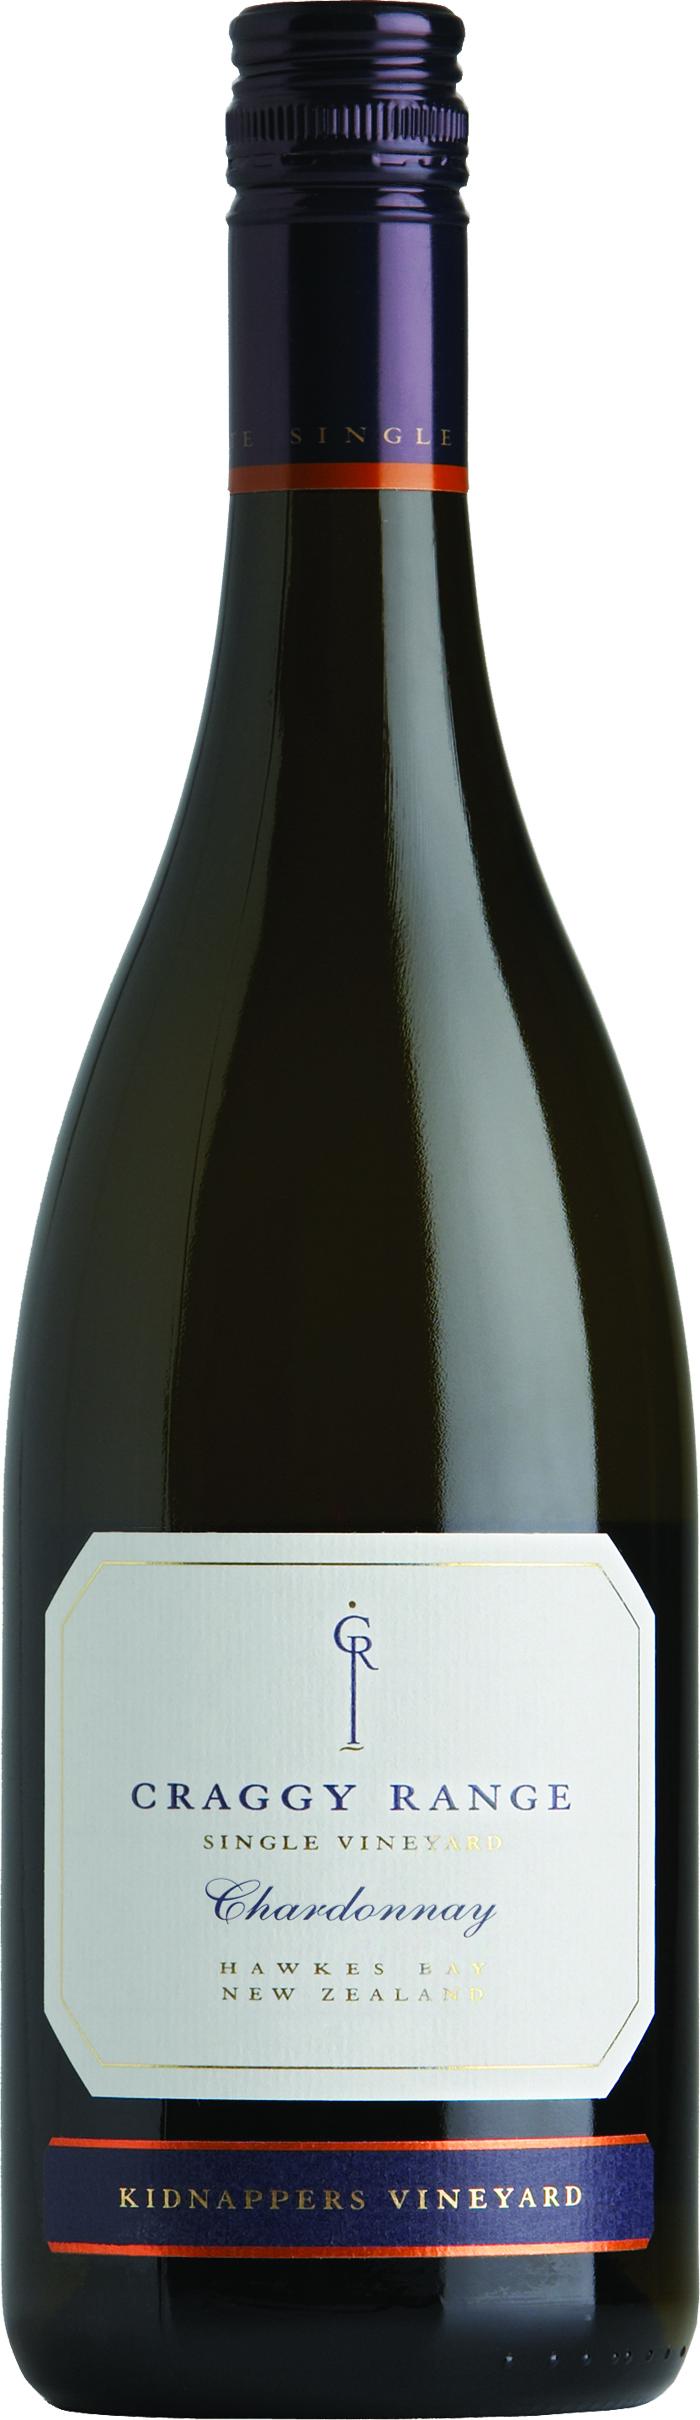 Craggy Range Chardonnay Kidnappers Vineyard